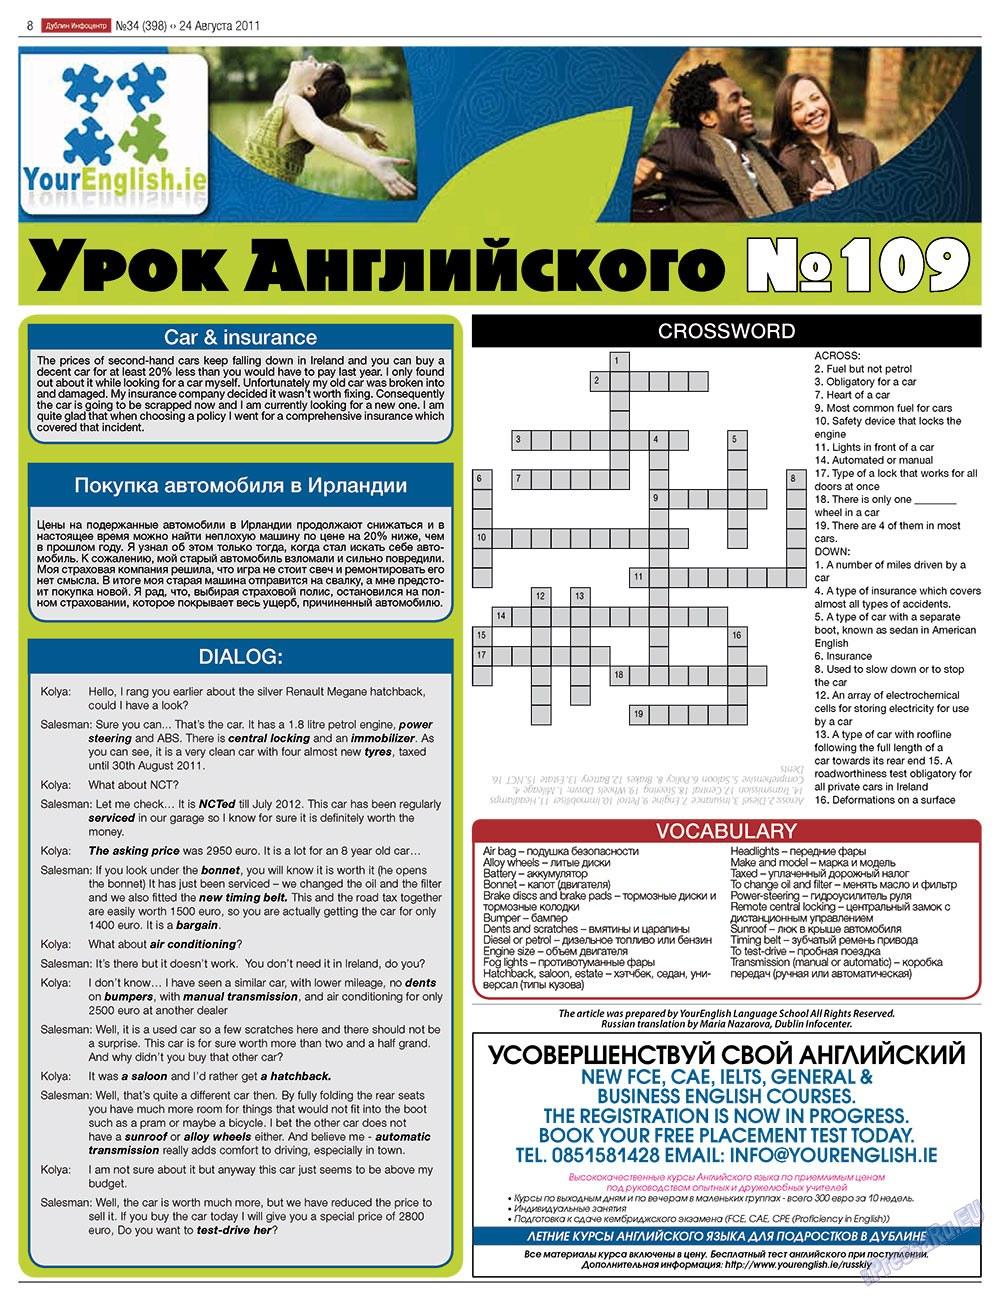 Дублин инфоцентр (газета). 2011 год, номер 34, стр. 8